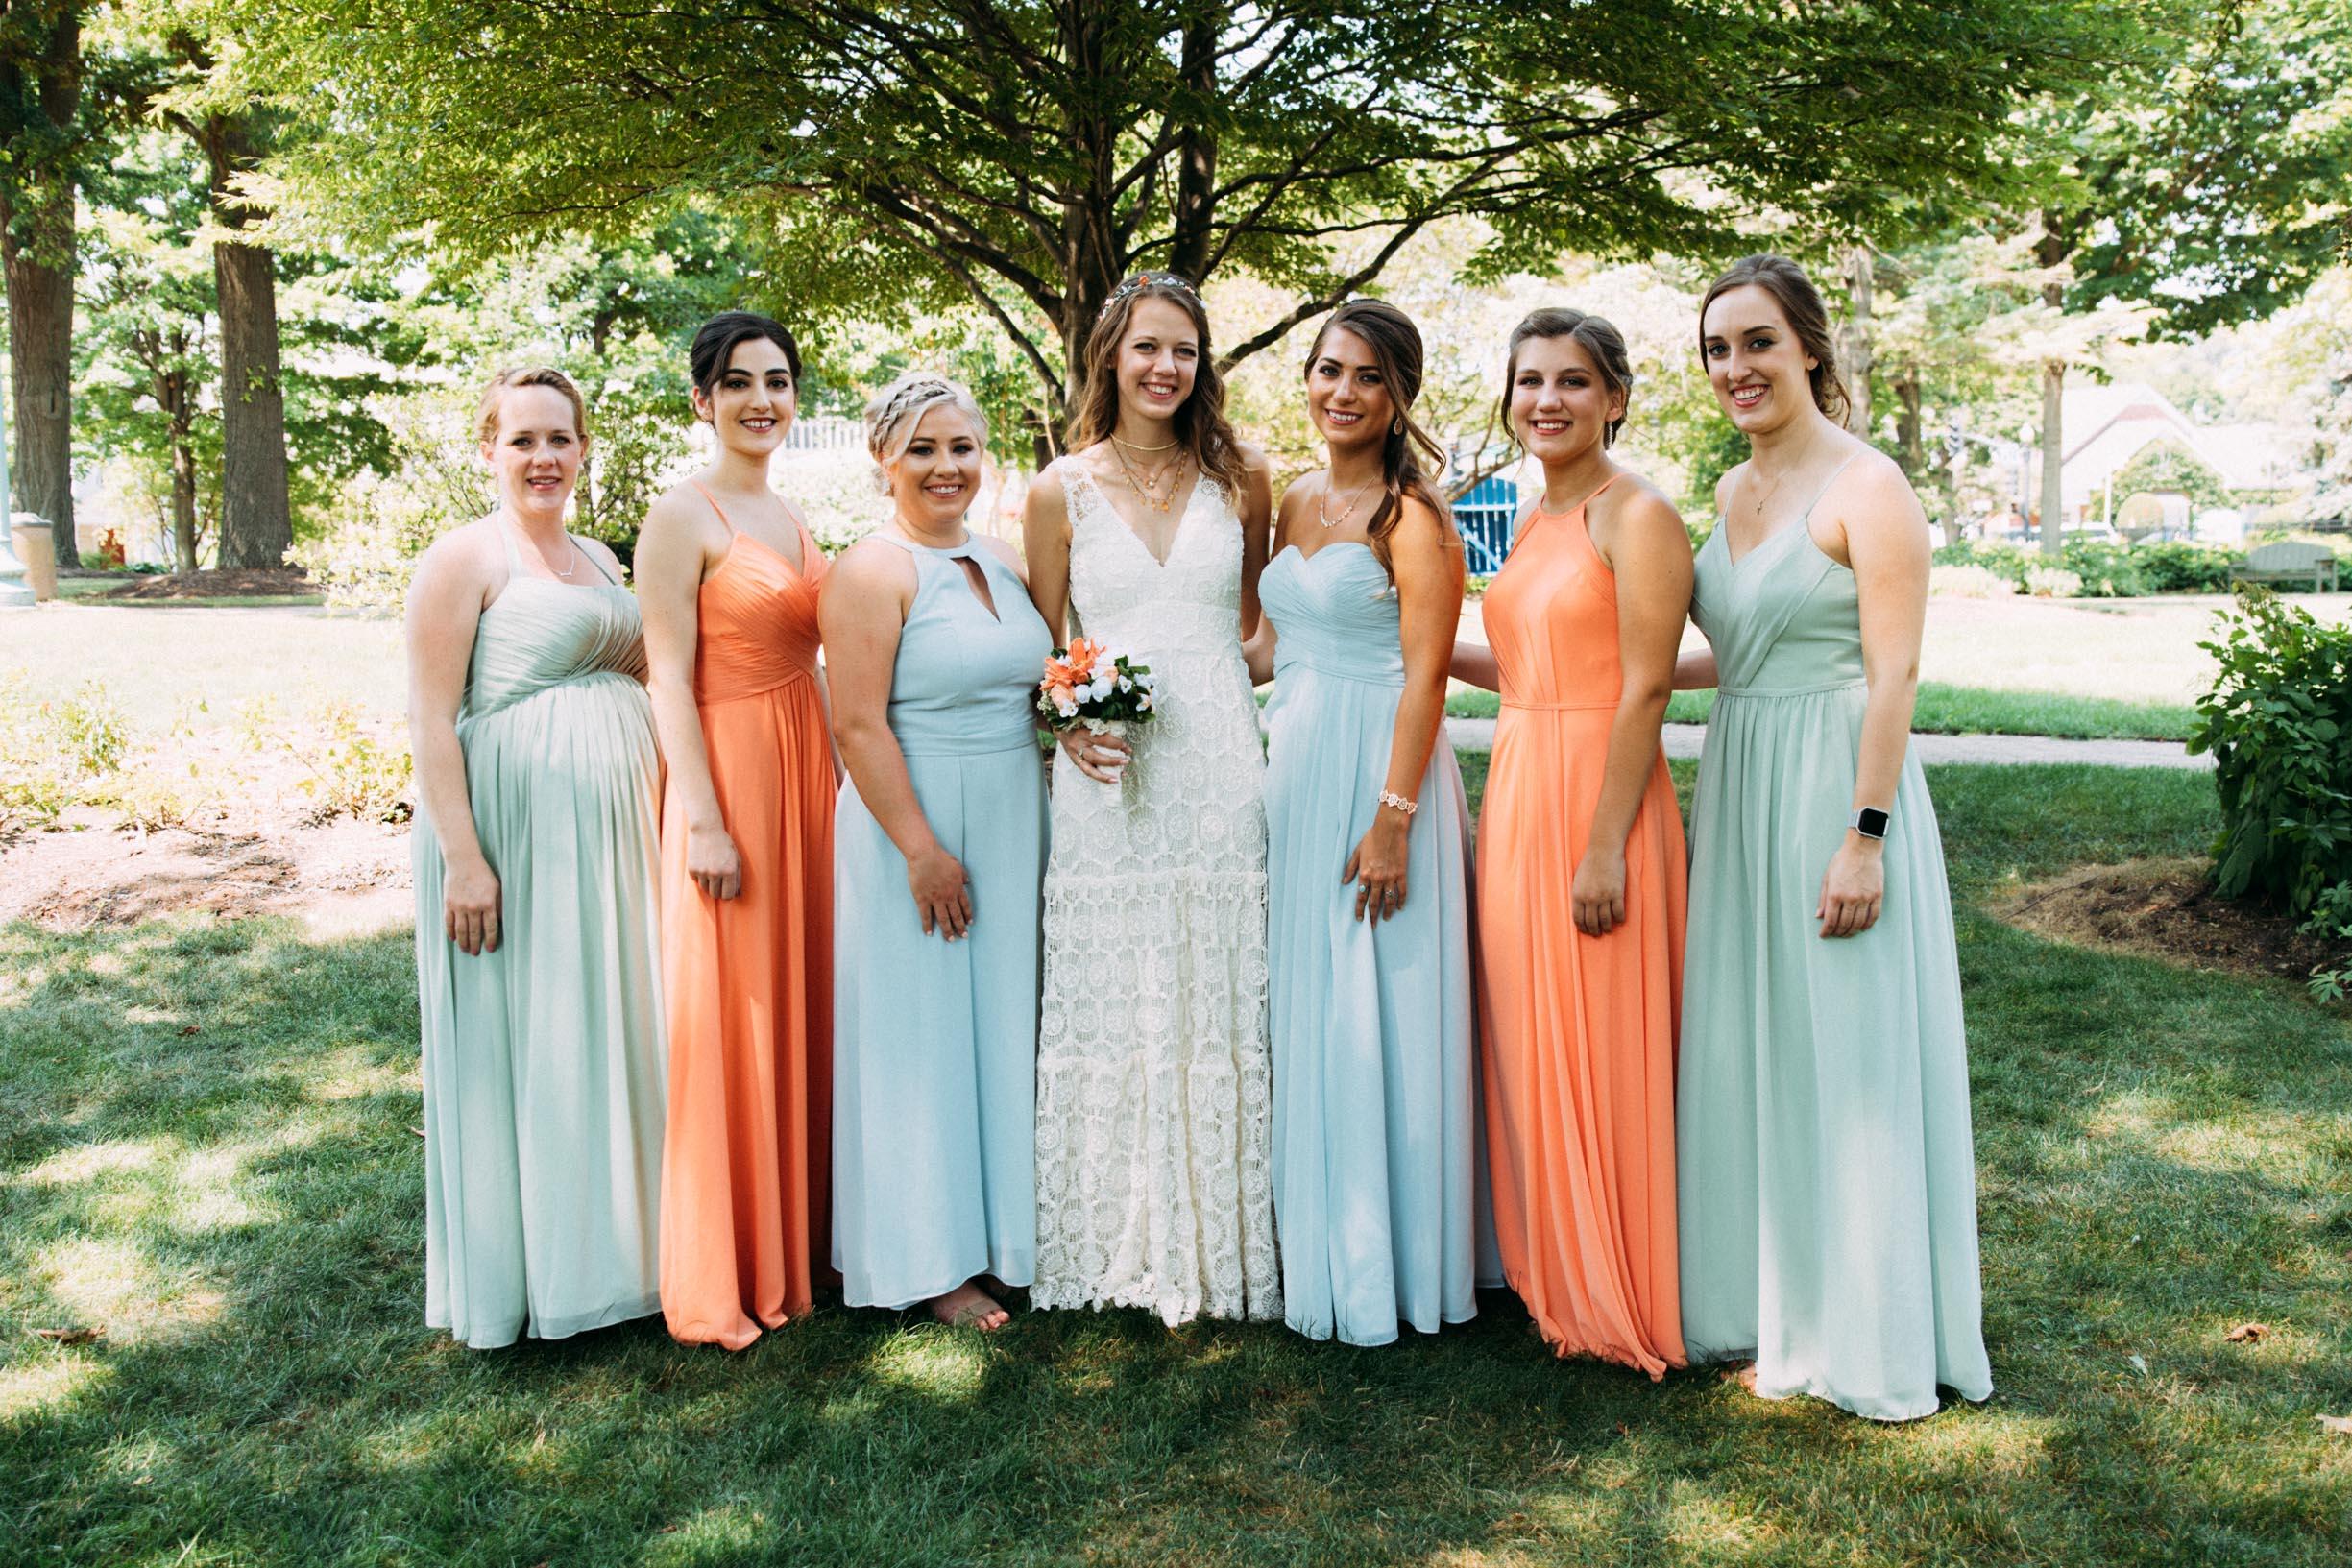 Rachel Josh Wedding Party Portrait Blog-23.jpg